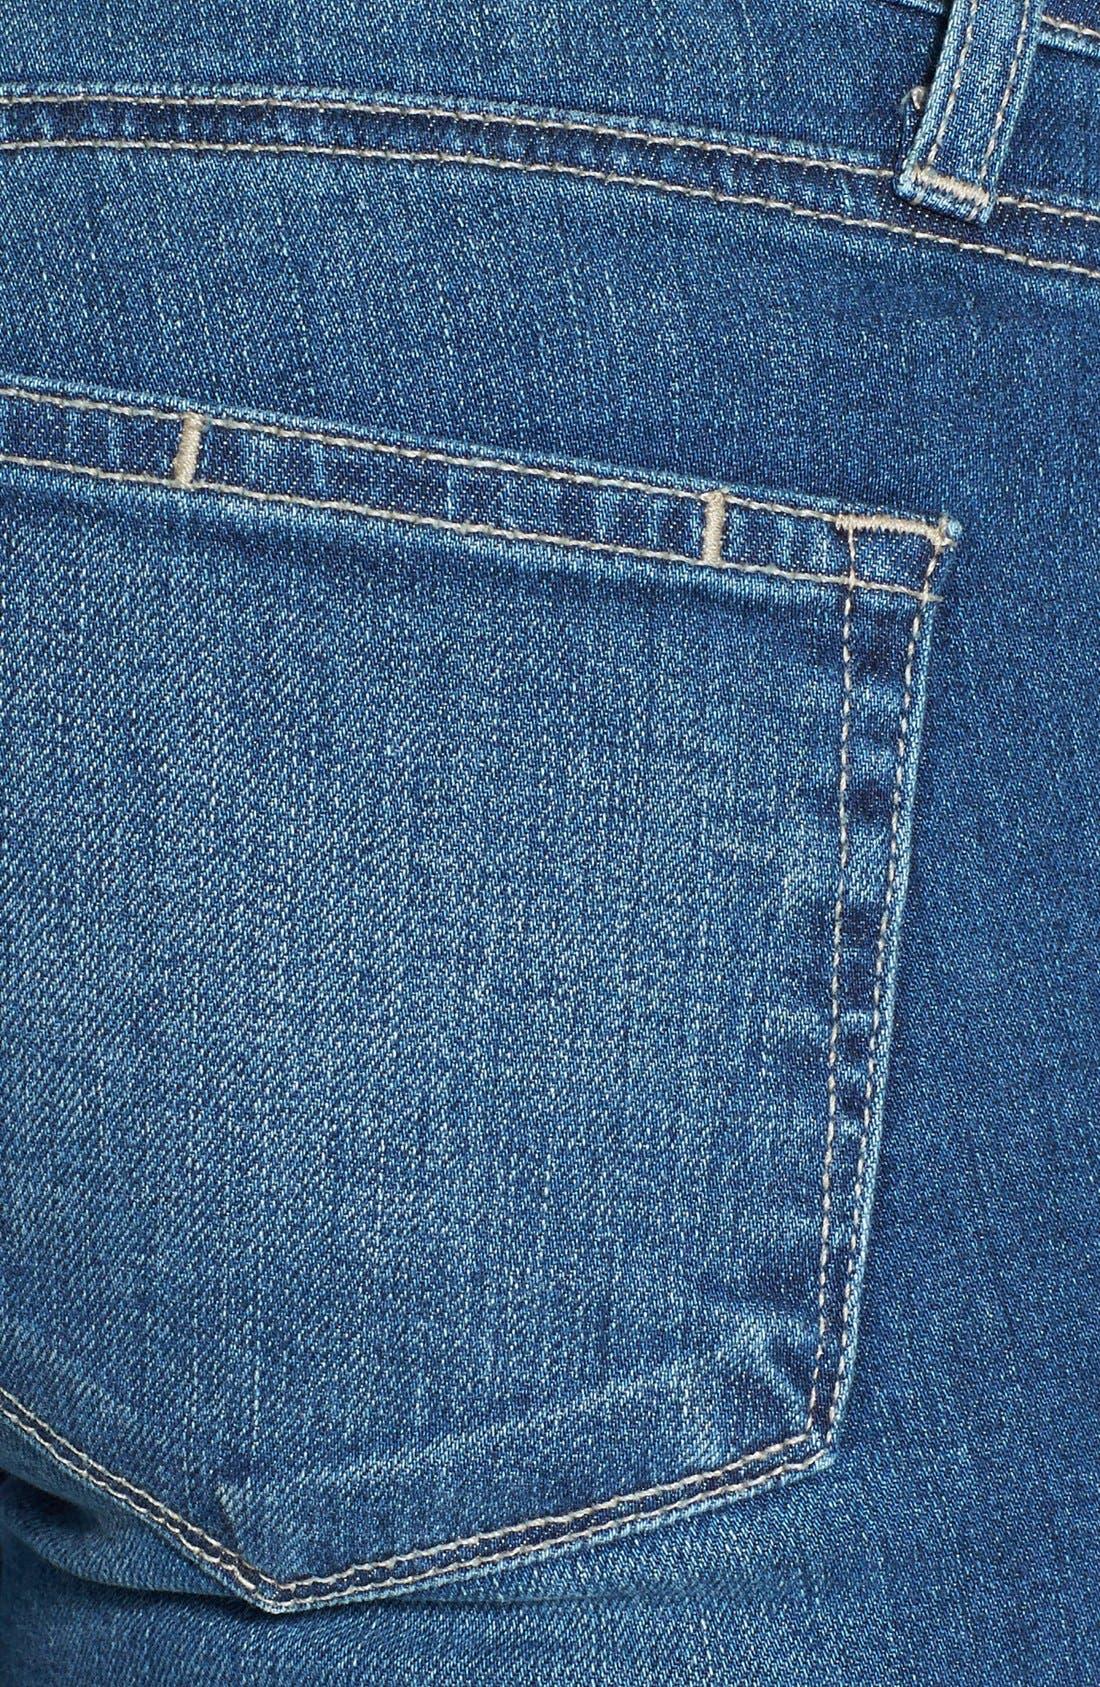 Alternate Image 3  - Paige Denim 'Verdugo' Destroyed Ankle Skinny Jeans (Belmont)